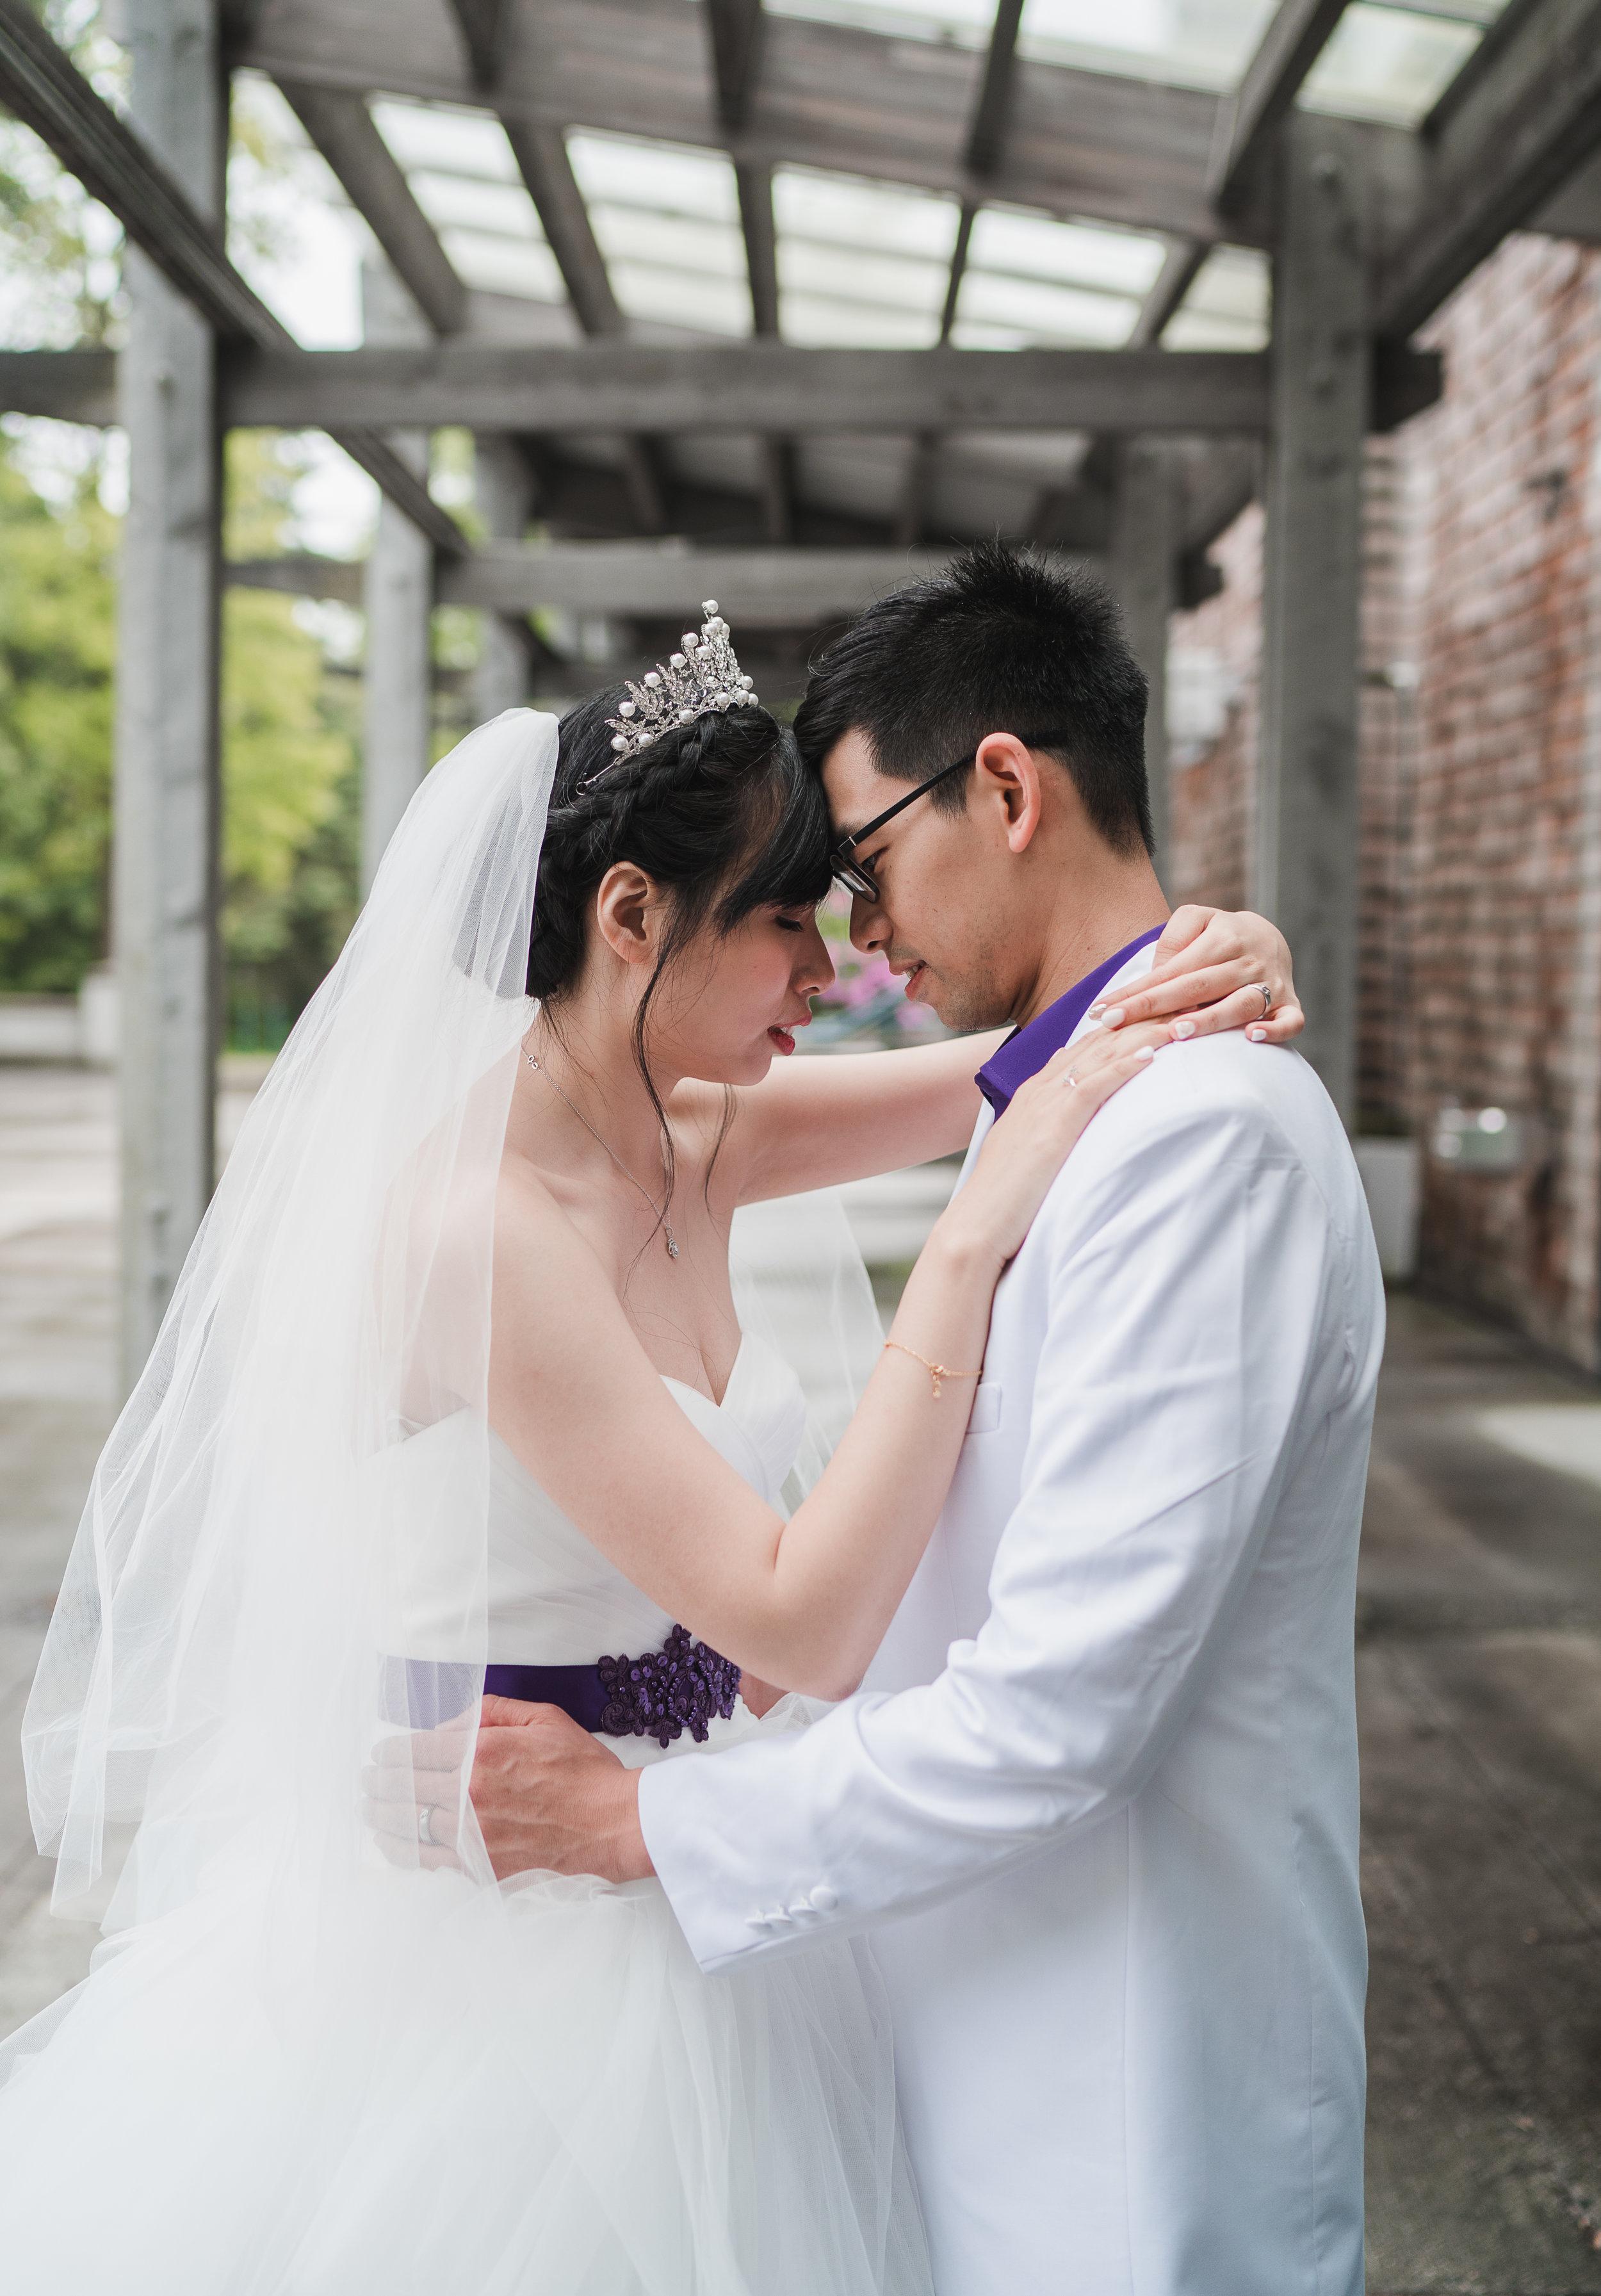 20190520 - Pamela & Matthew Wedding- 0716.jpg